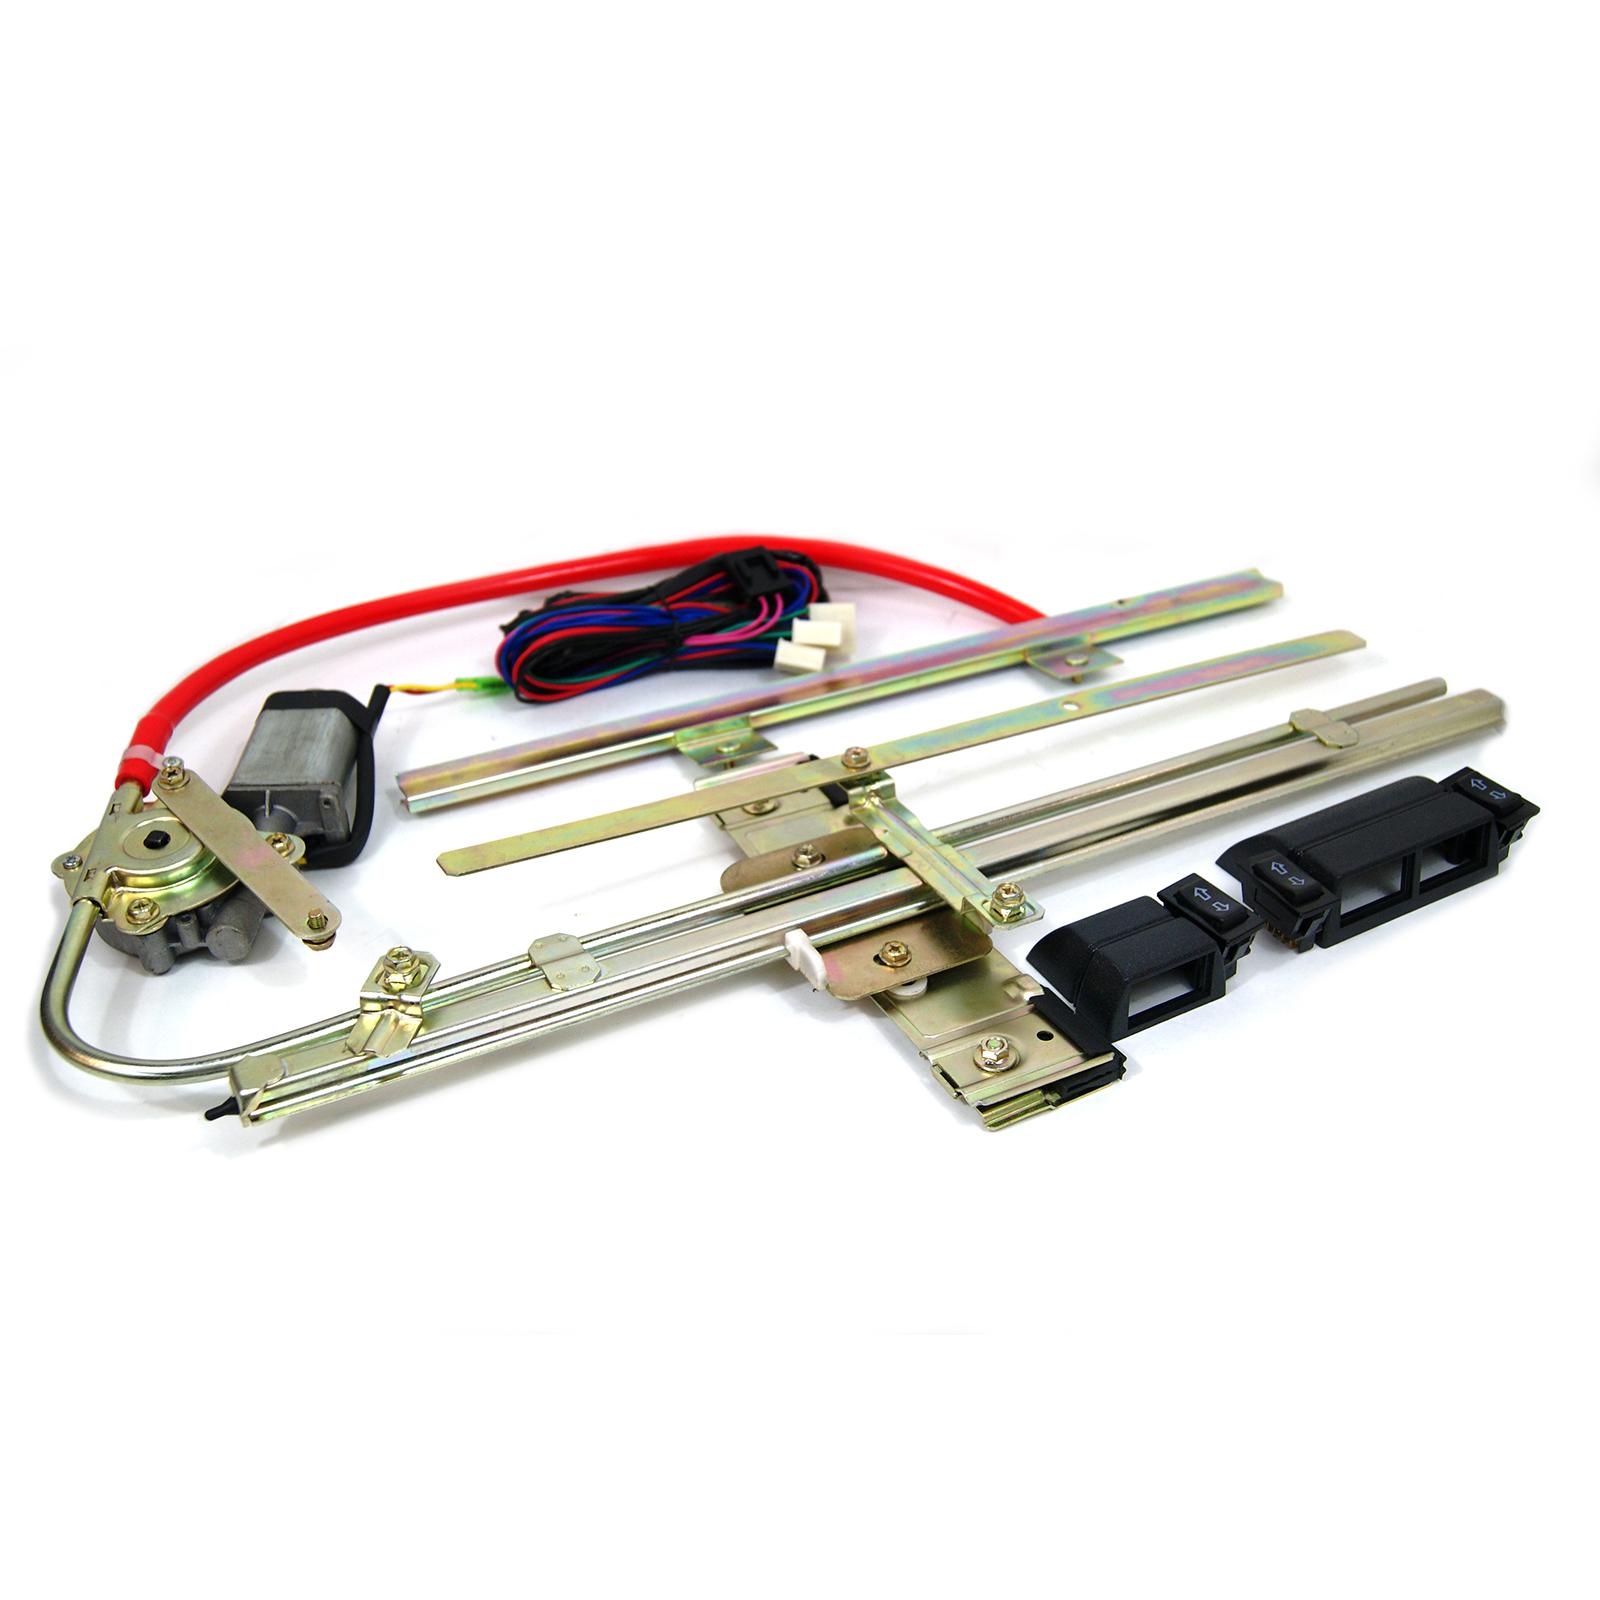 speedmaster pce422 1001 power window kits power window kit wiring diagram power window conversion kit wiring diagram